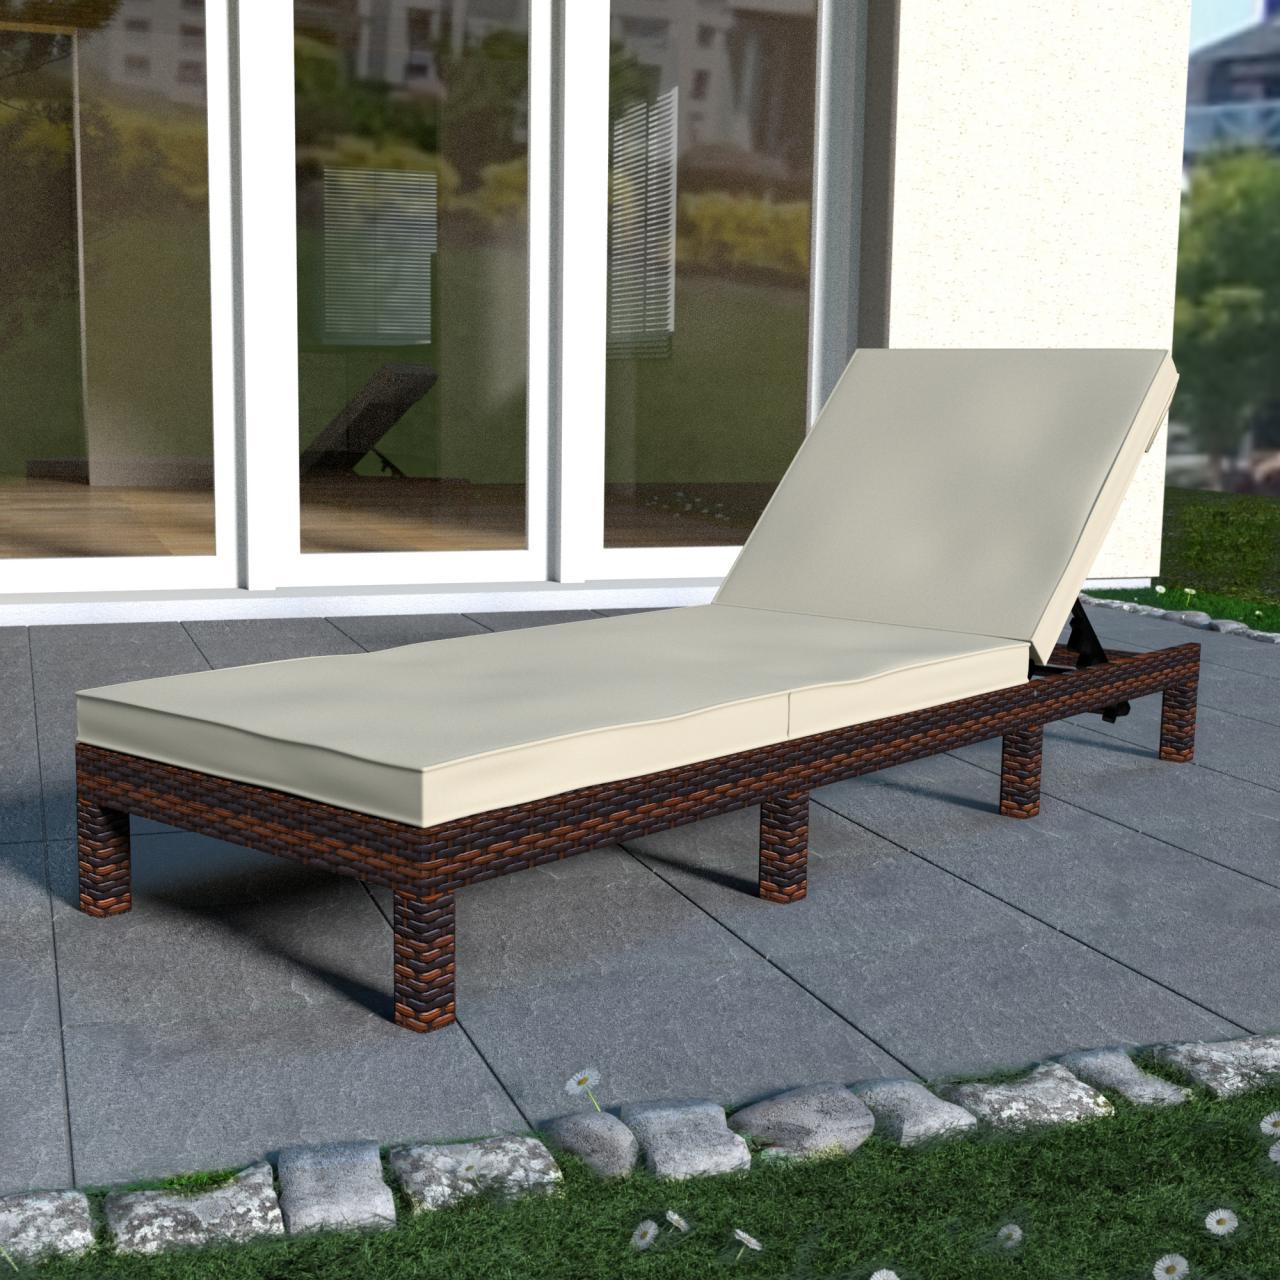 polyrattan sonnenliege garten liege rattan gartenm bel rattanm bel gartenliege ebay. Black Bedroom Furniture Sets. Home Design Ideas